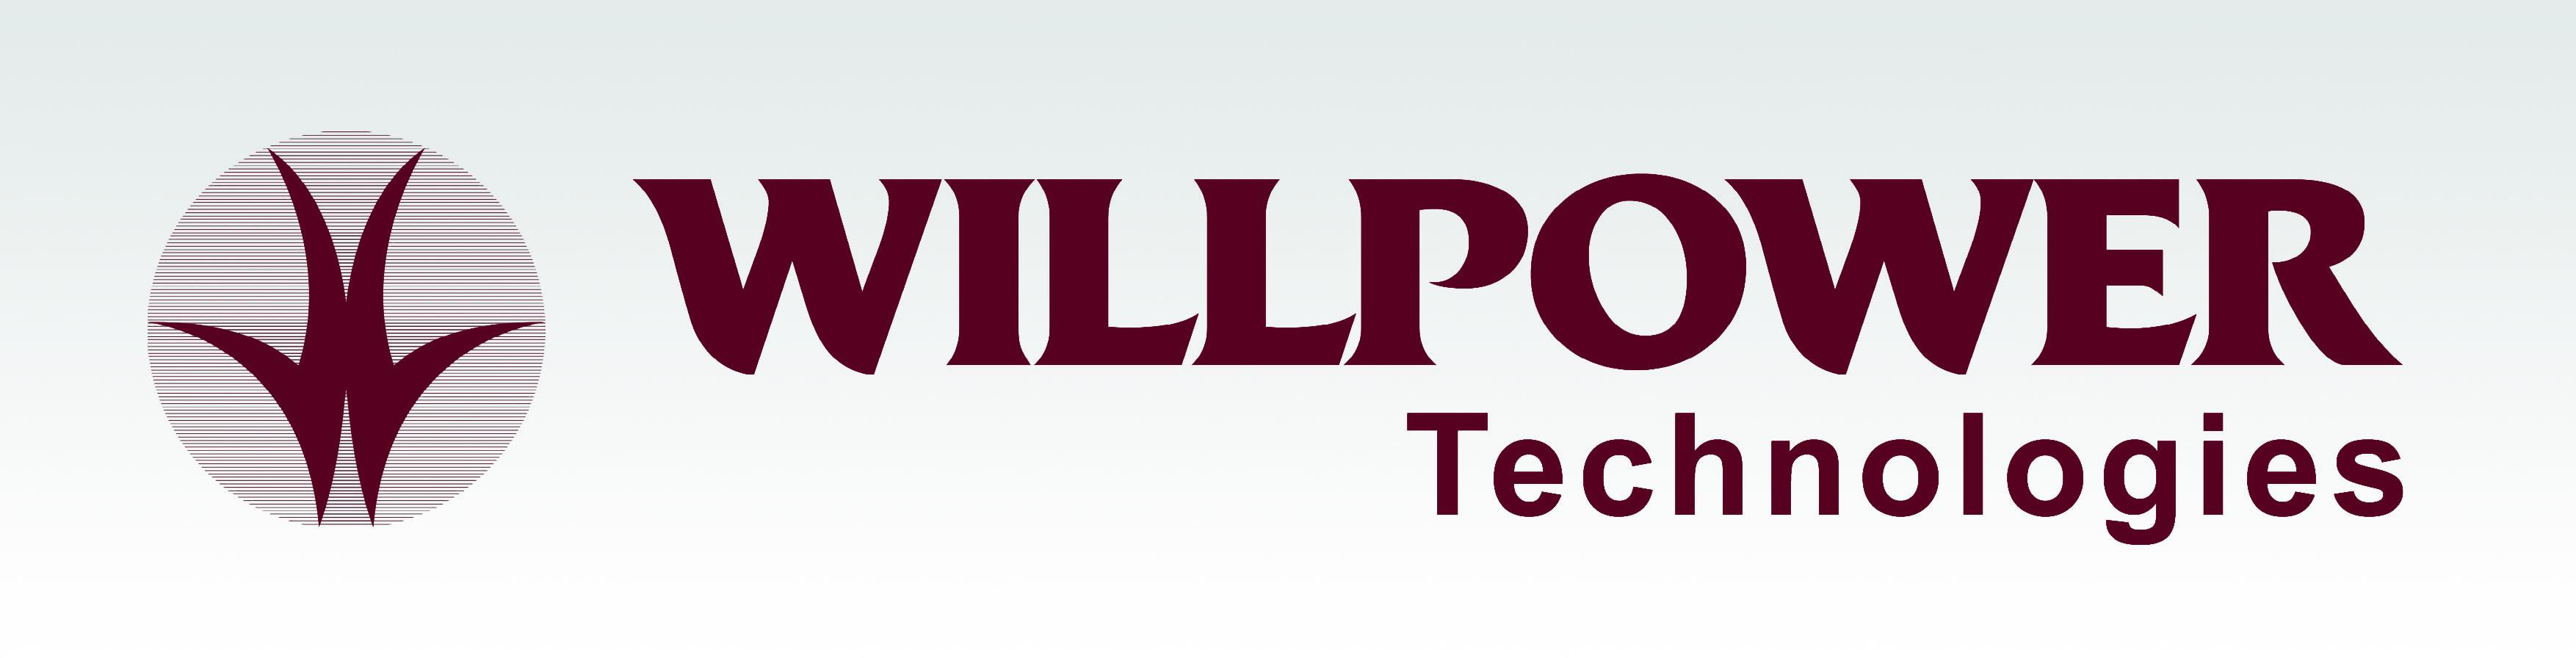 Willpower Technologies - Hyderabad Image